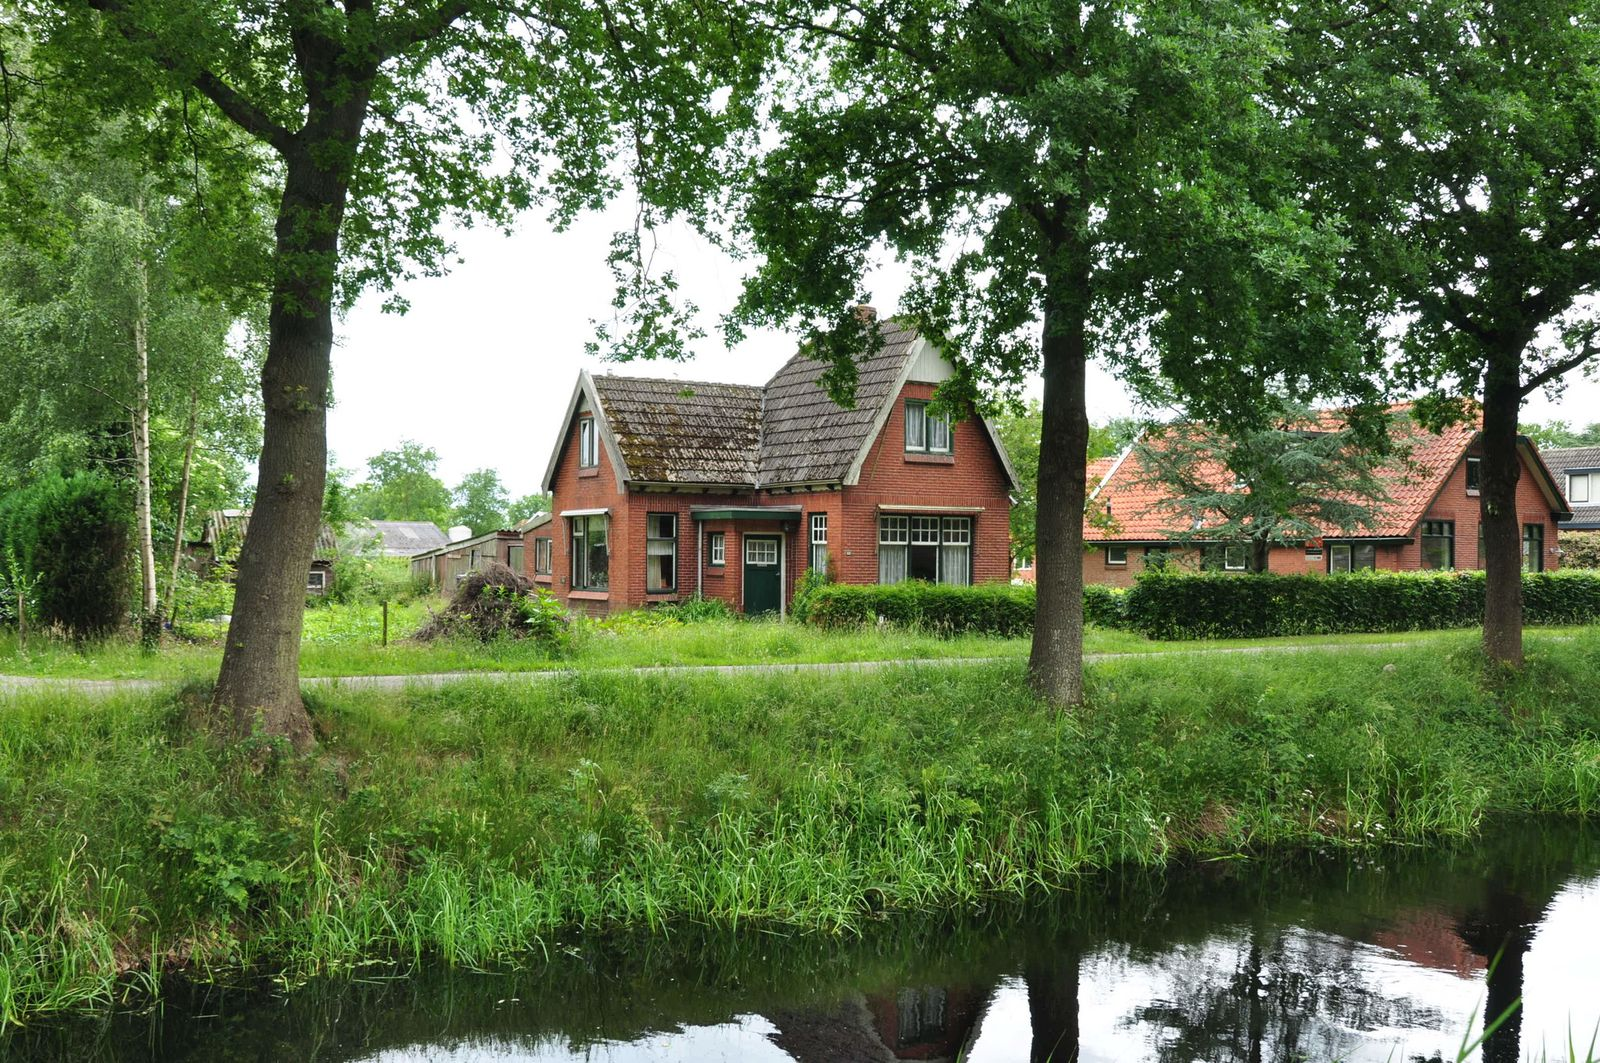 Slinke 3, Haulerwijk